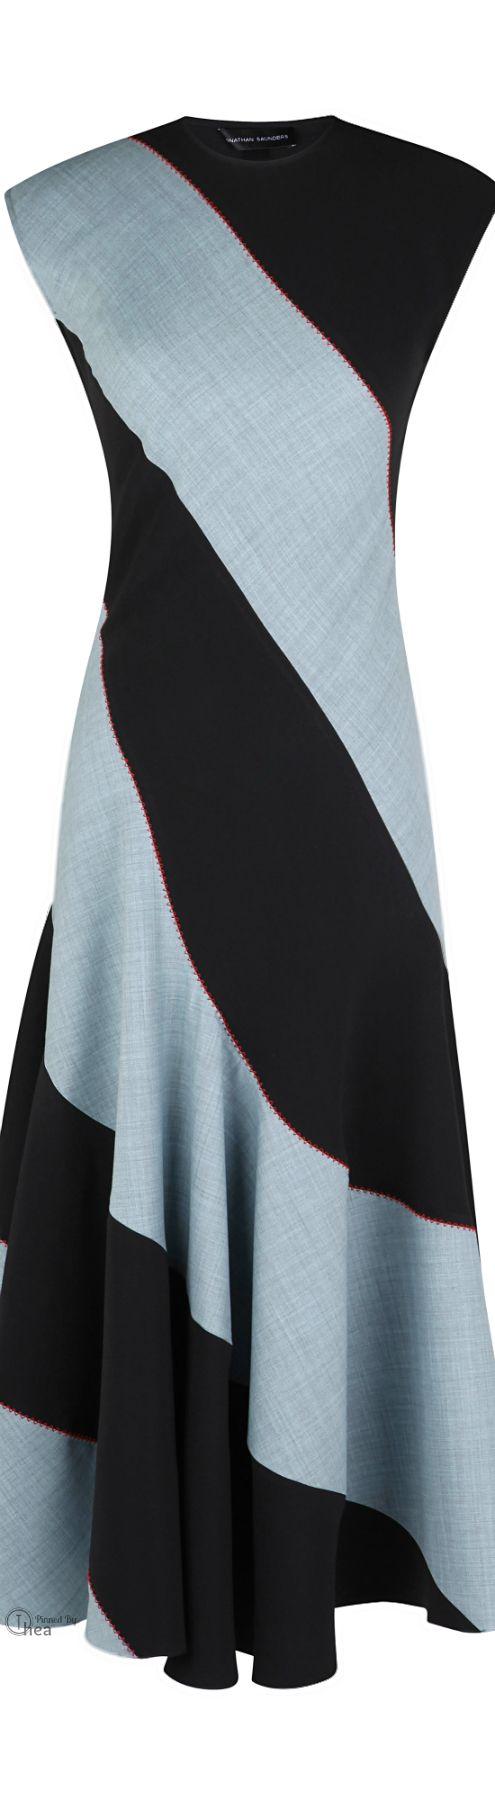 Jonathan Saunders, FW 2014 ● Wool Suiting Dress        WW/MC